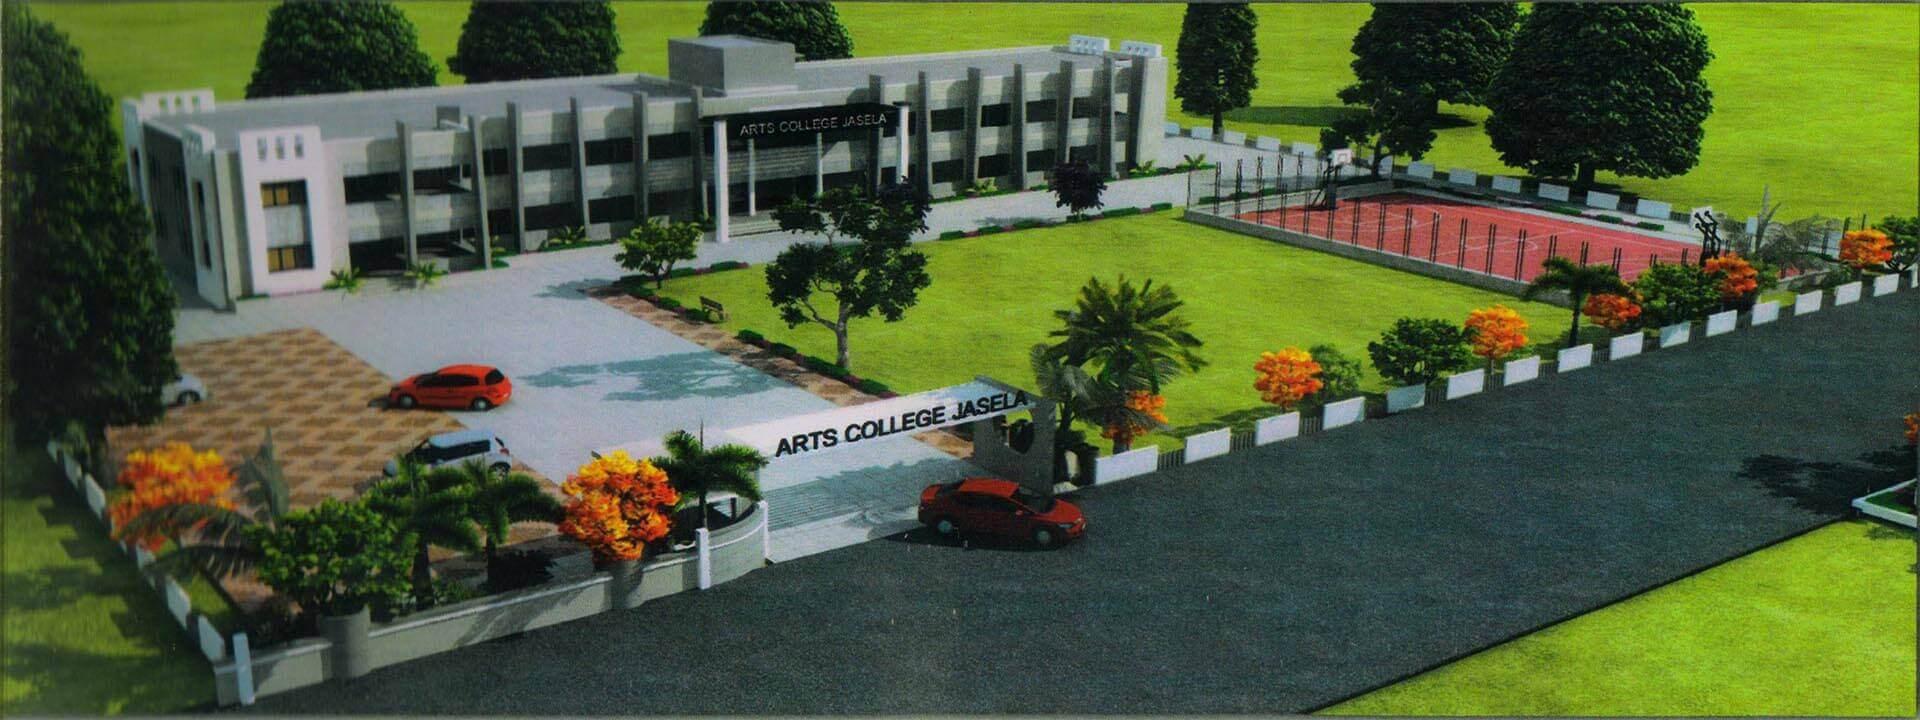 Arts College, Jasela Image